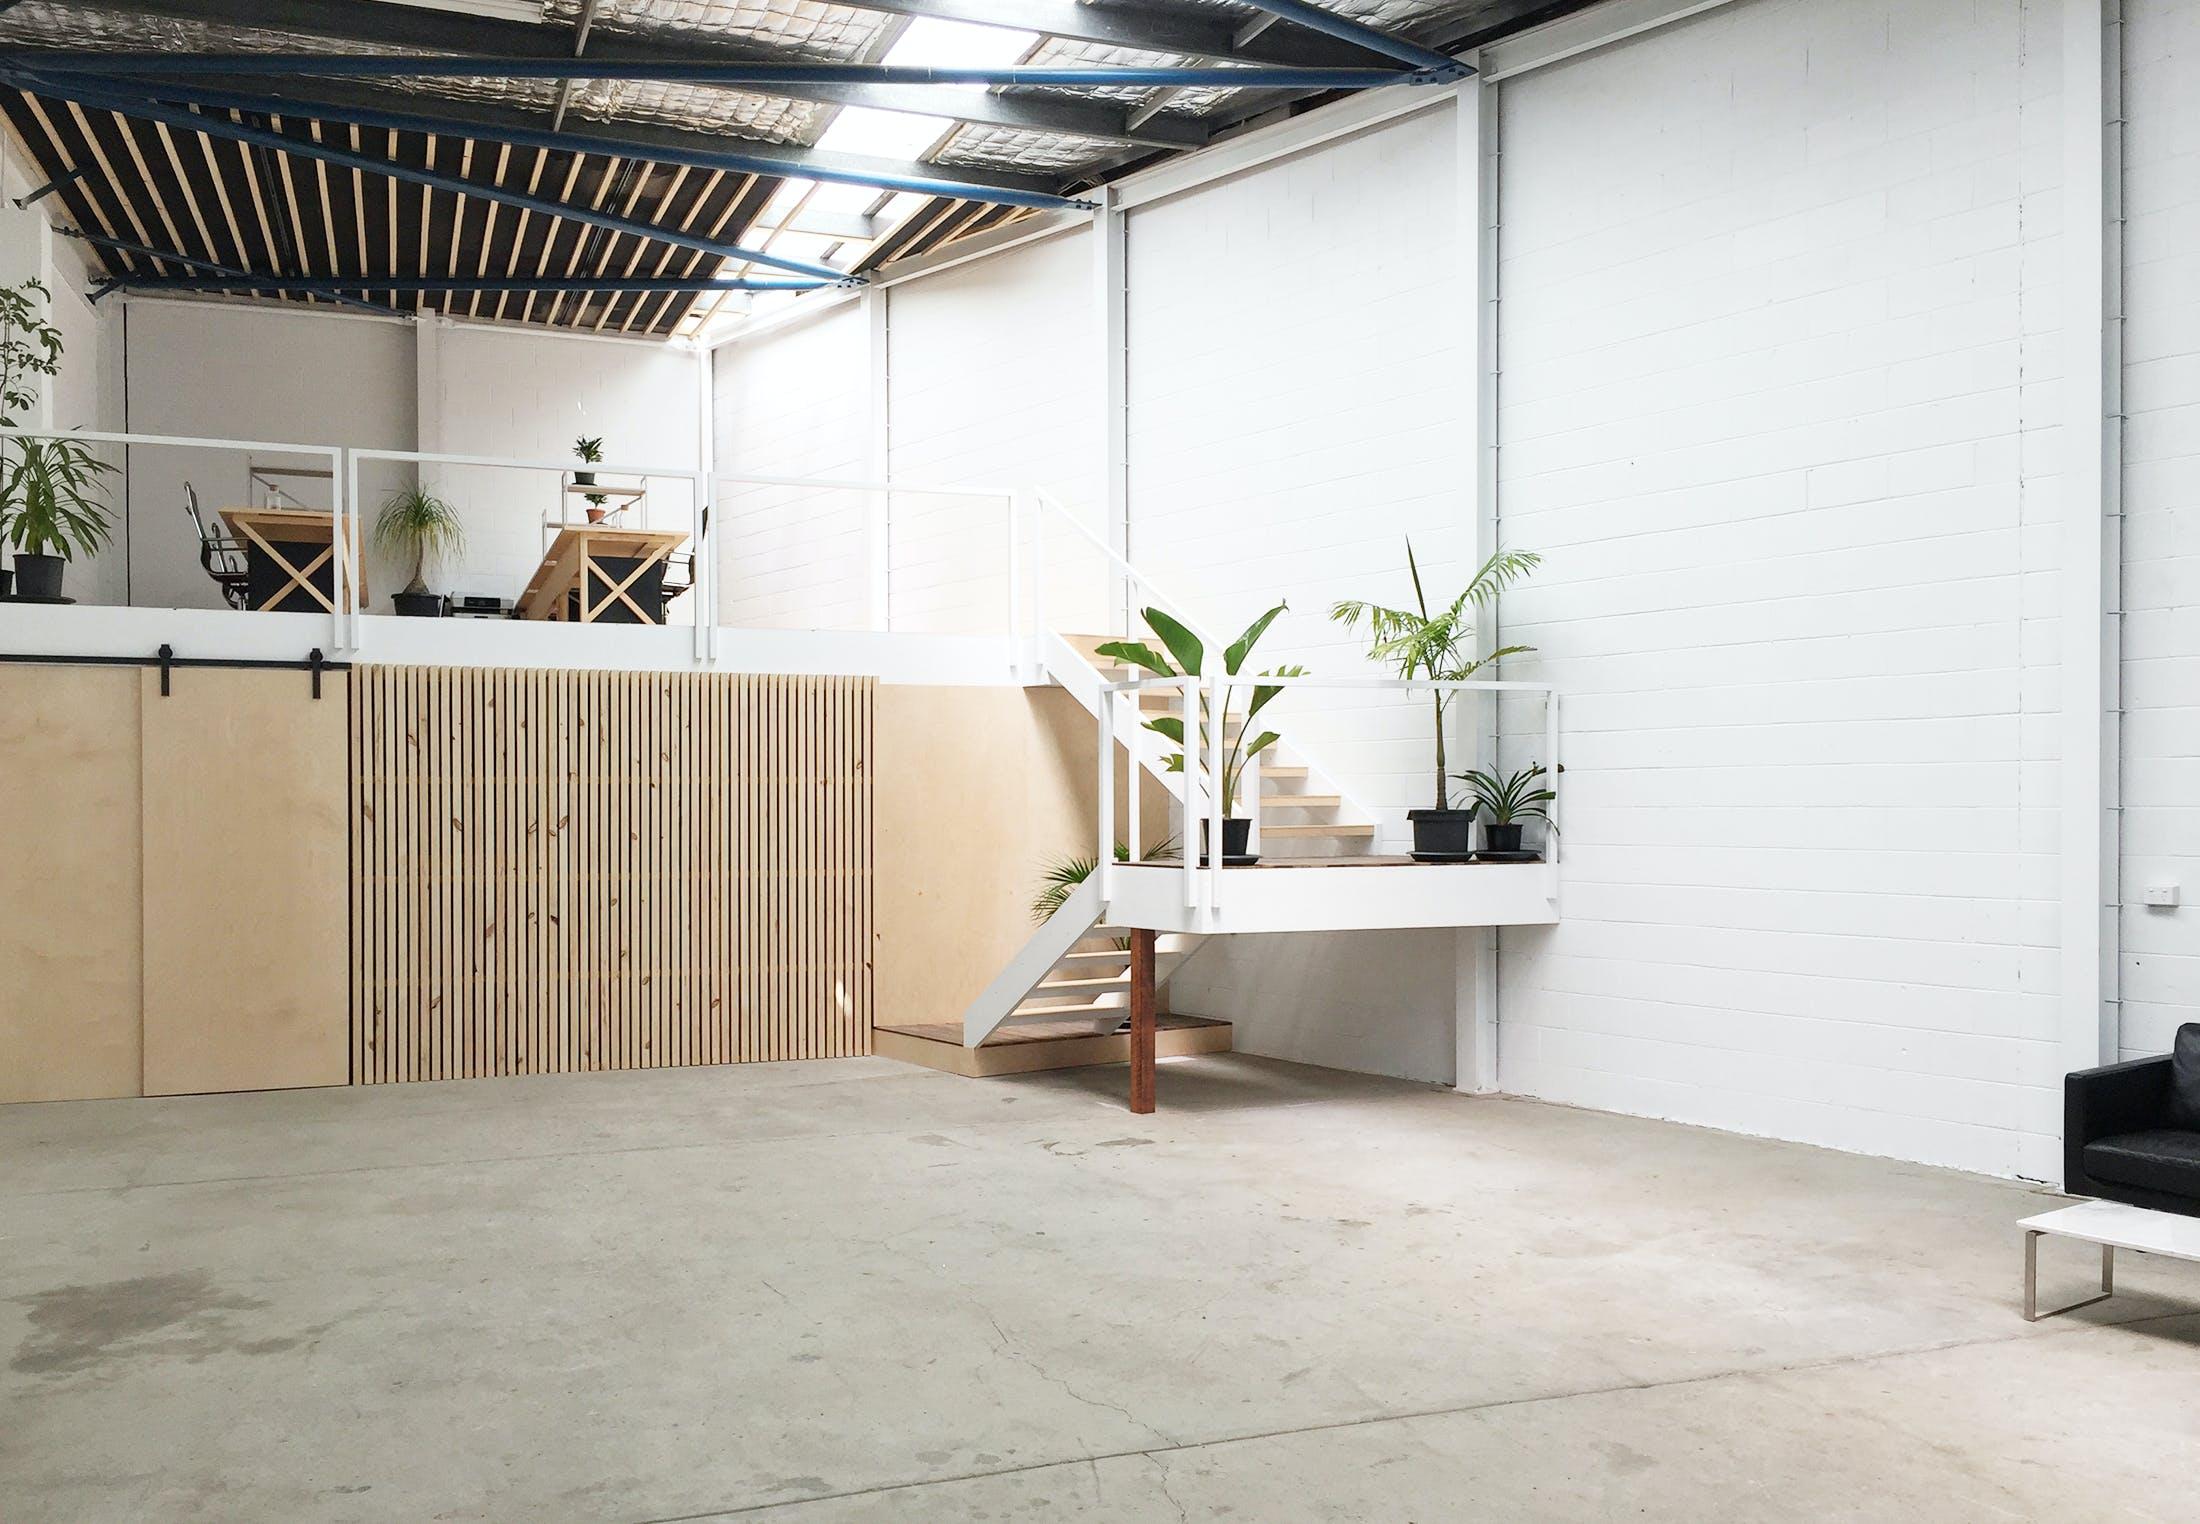 KGDM Ground Floor, multi-use area at KGDM, image 2